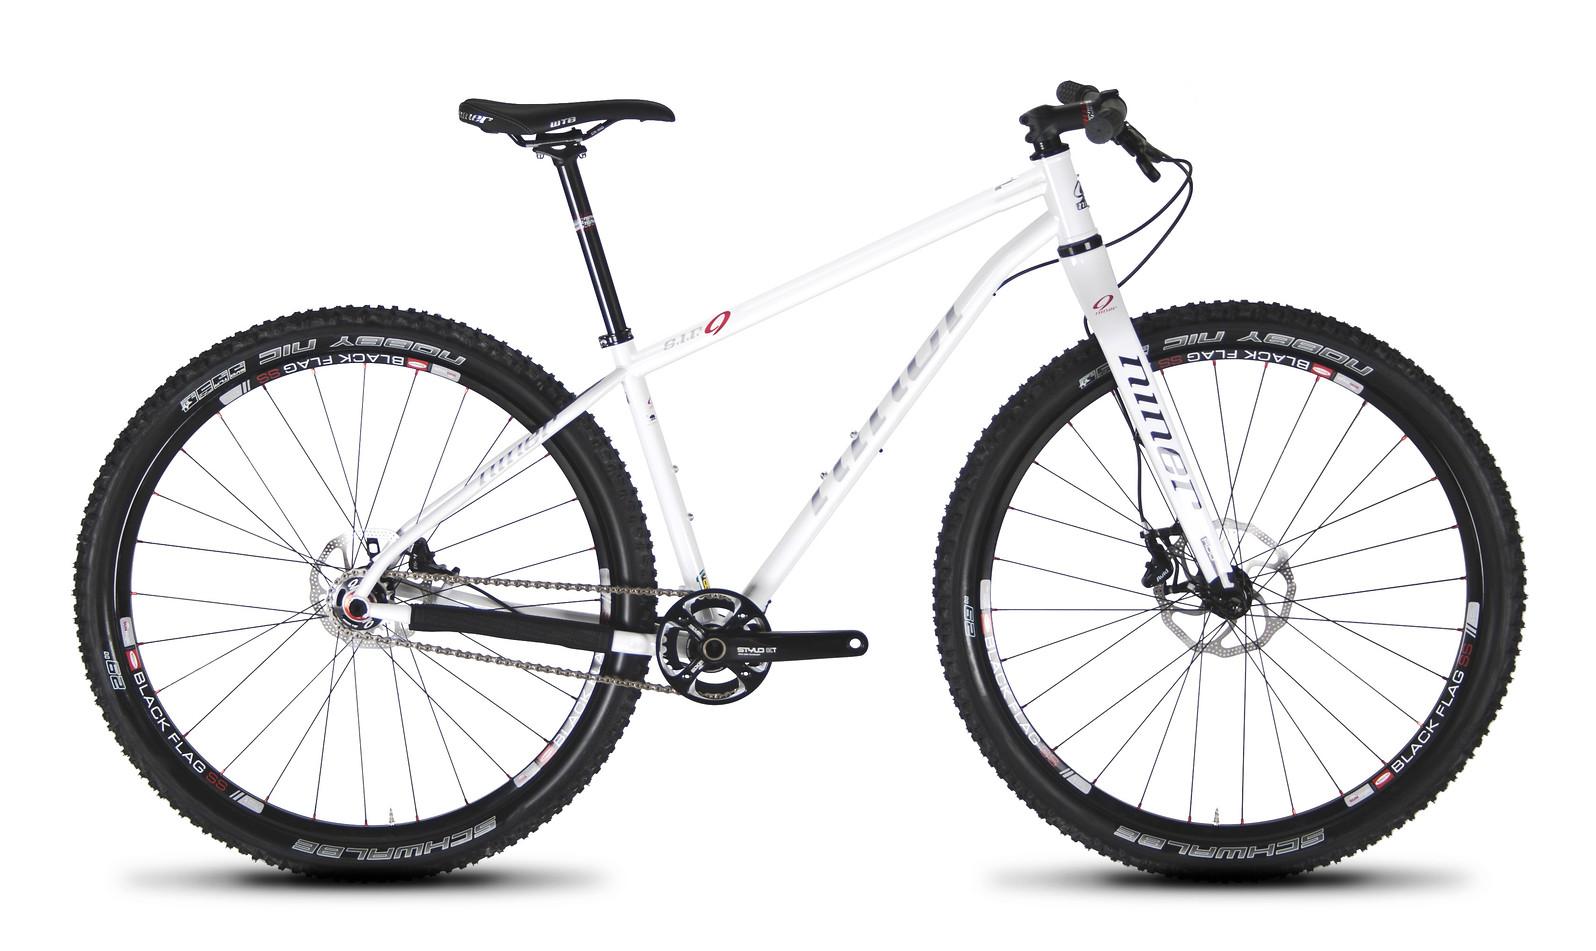 2013 Niner S.I.R. 9 Singlespeed Bike - Reviews, Comparisons, Specs ...